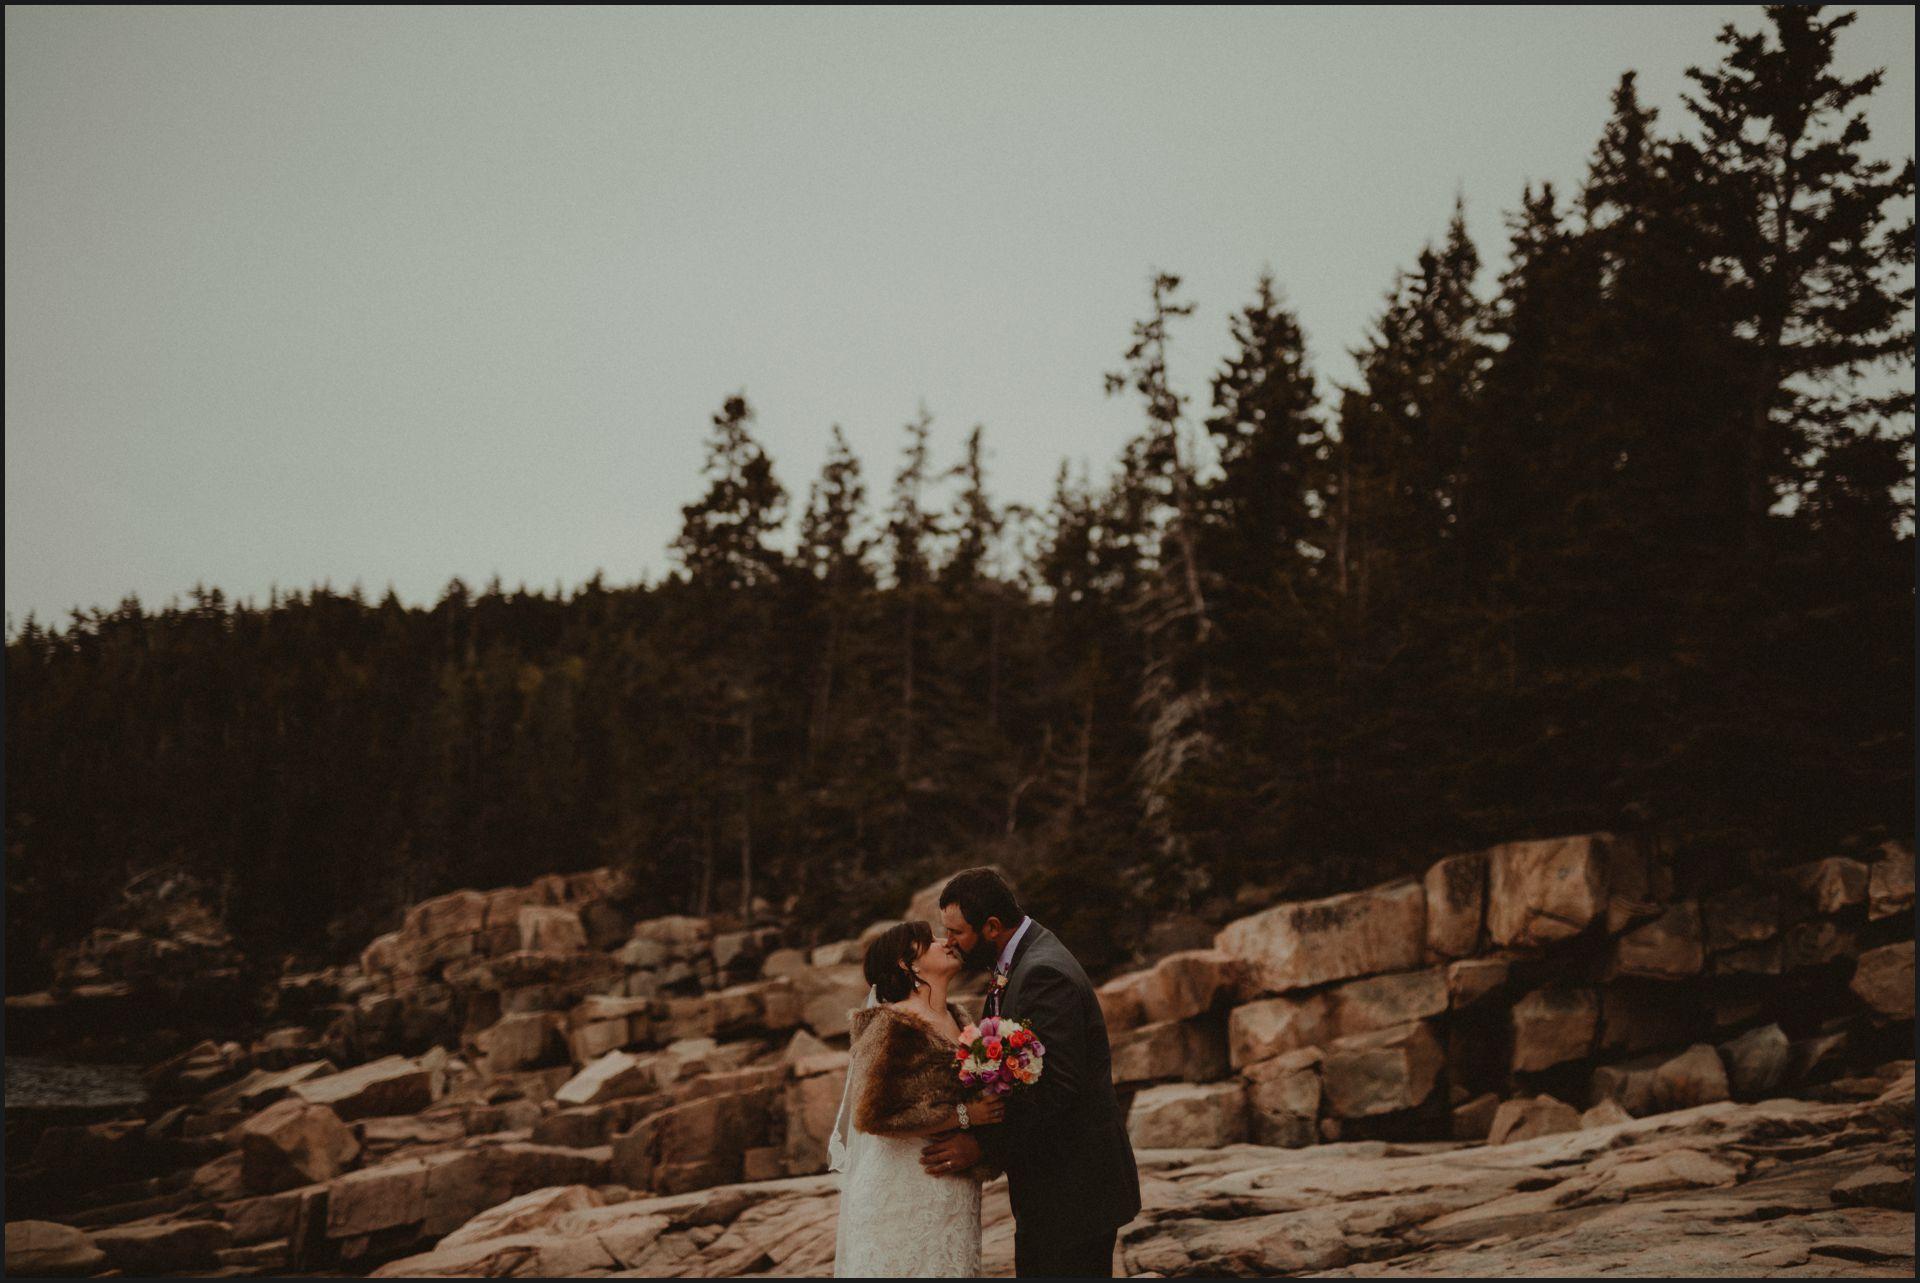 acadia national park, maine, wedding, couple portrait, bride, groom, beach wedding